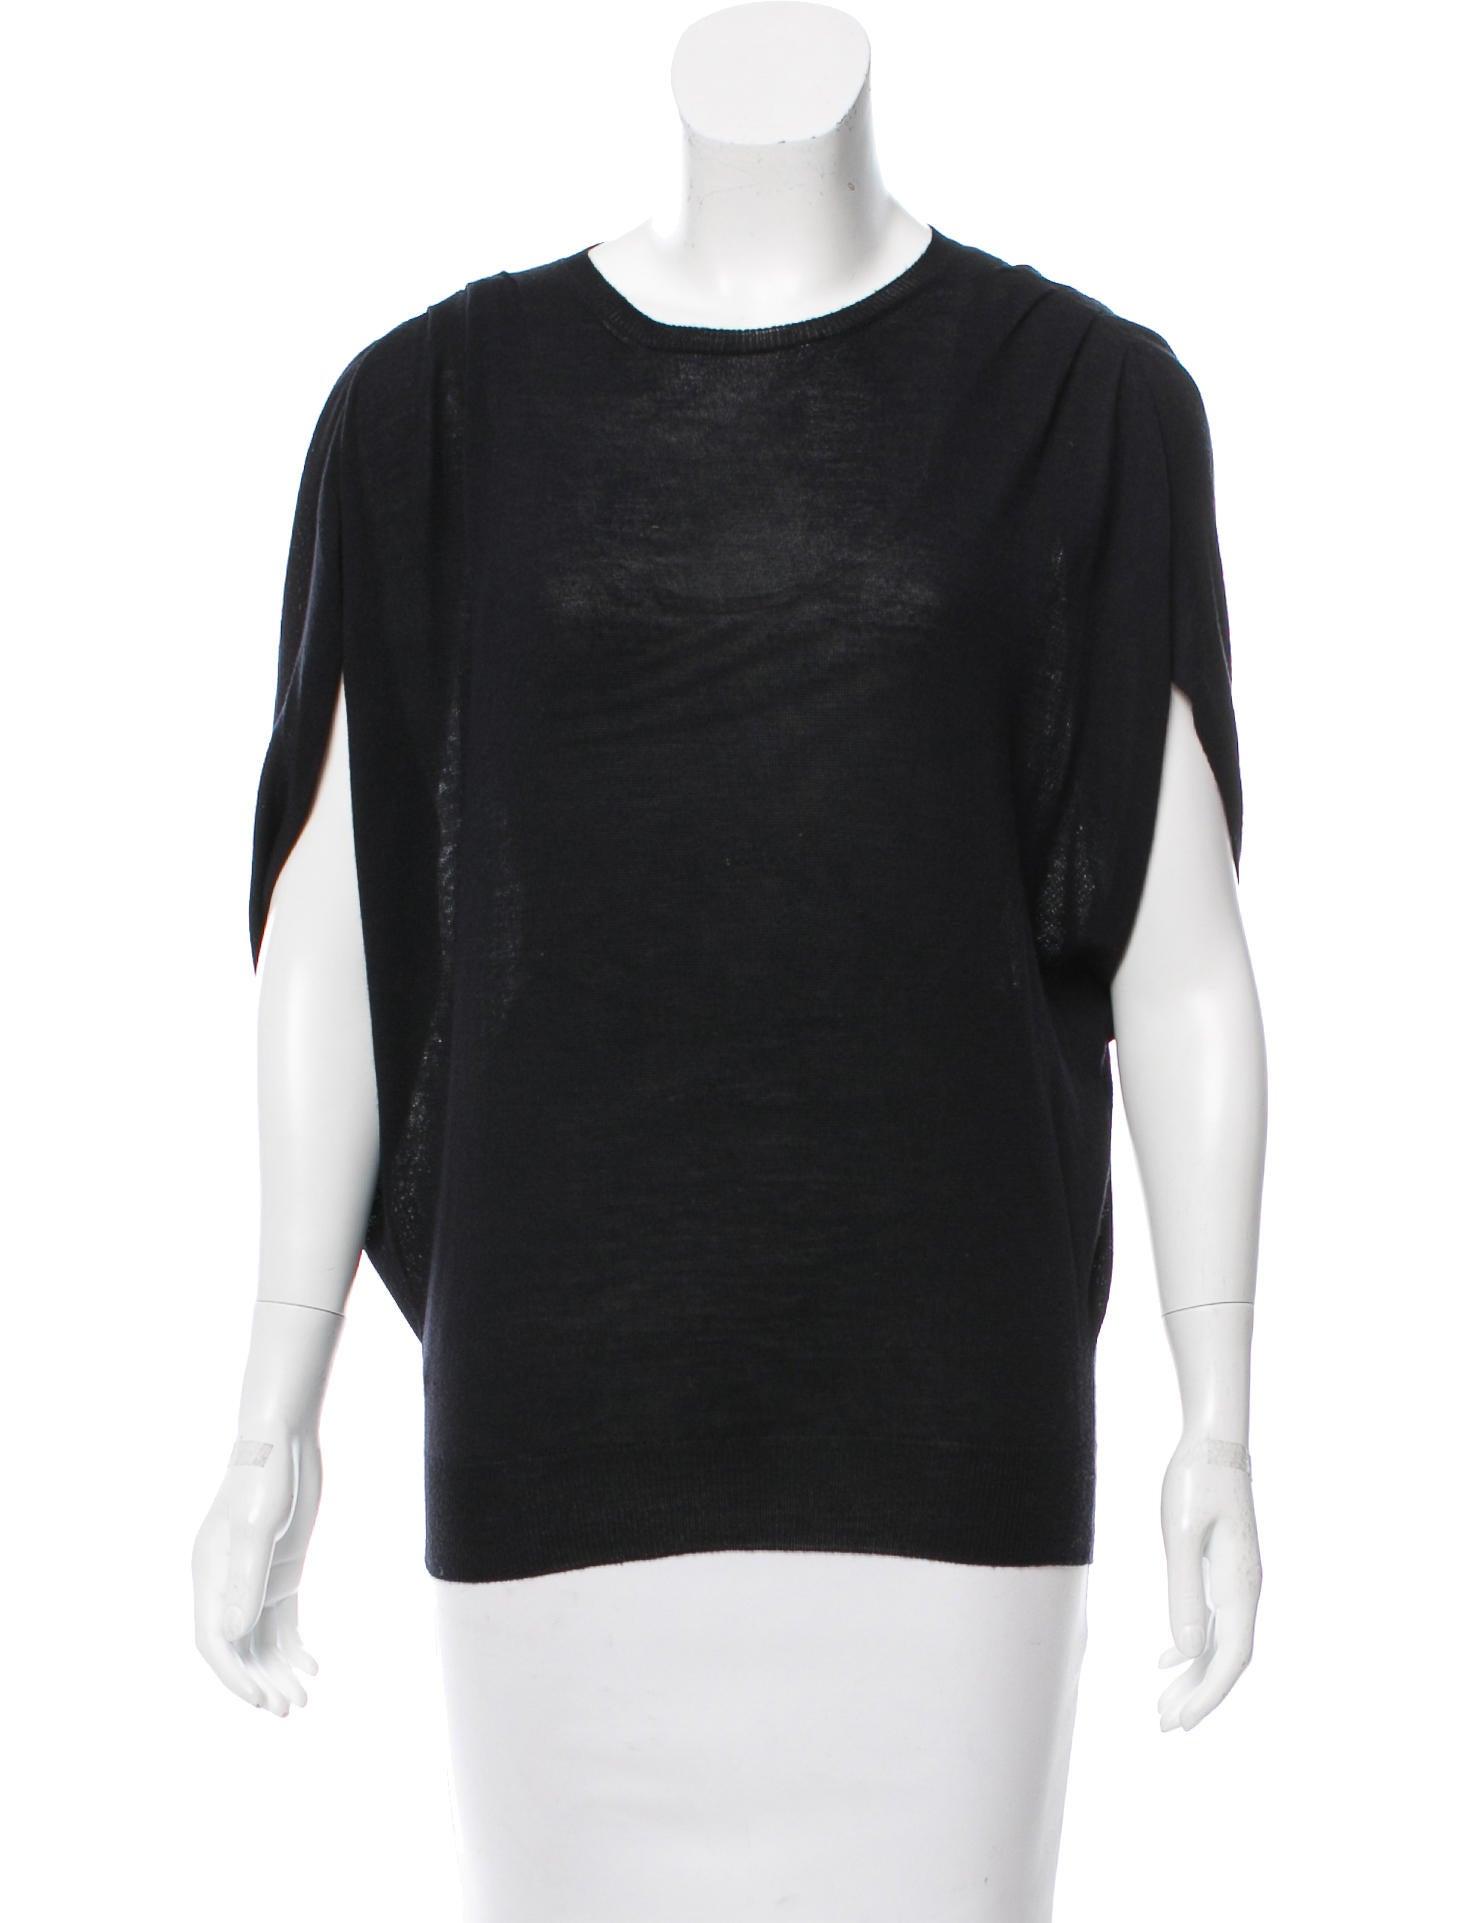 Prada wool sleeveless top clothing pra150801 the for Best wool shirt jackets